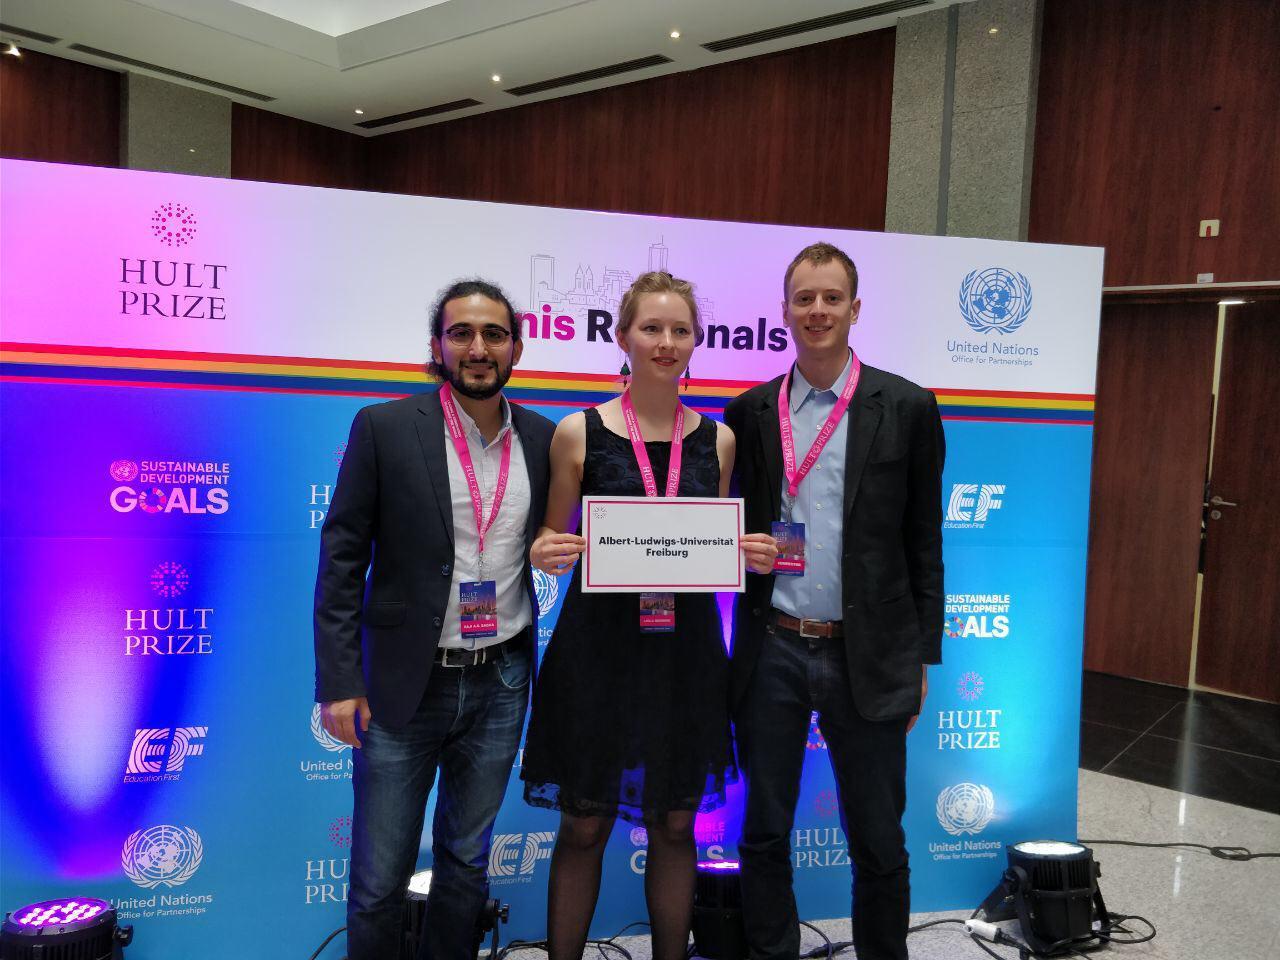 MEG-Studenten gewinnen Hult-Prize Regionals in Tunesien (22.03.2018)